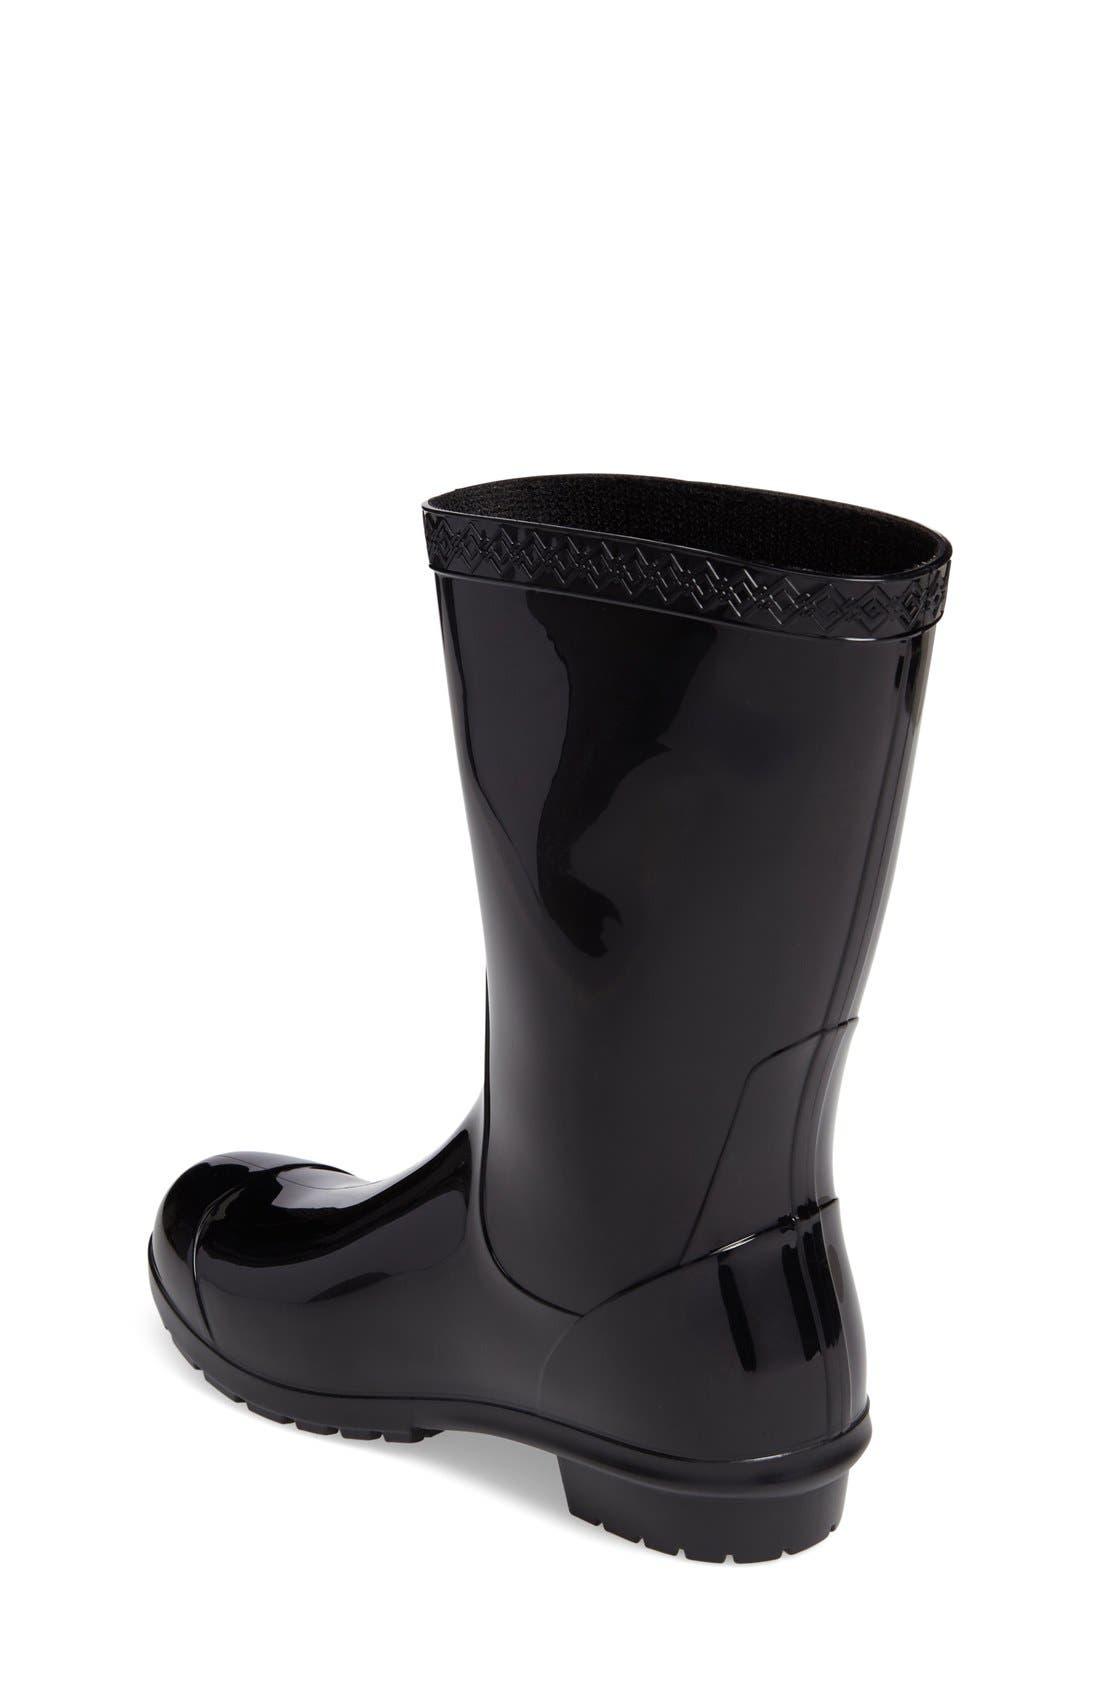 Raana Waterproof Rain Boot,                             Alternate thumbnail 6, color,                             BLACK